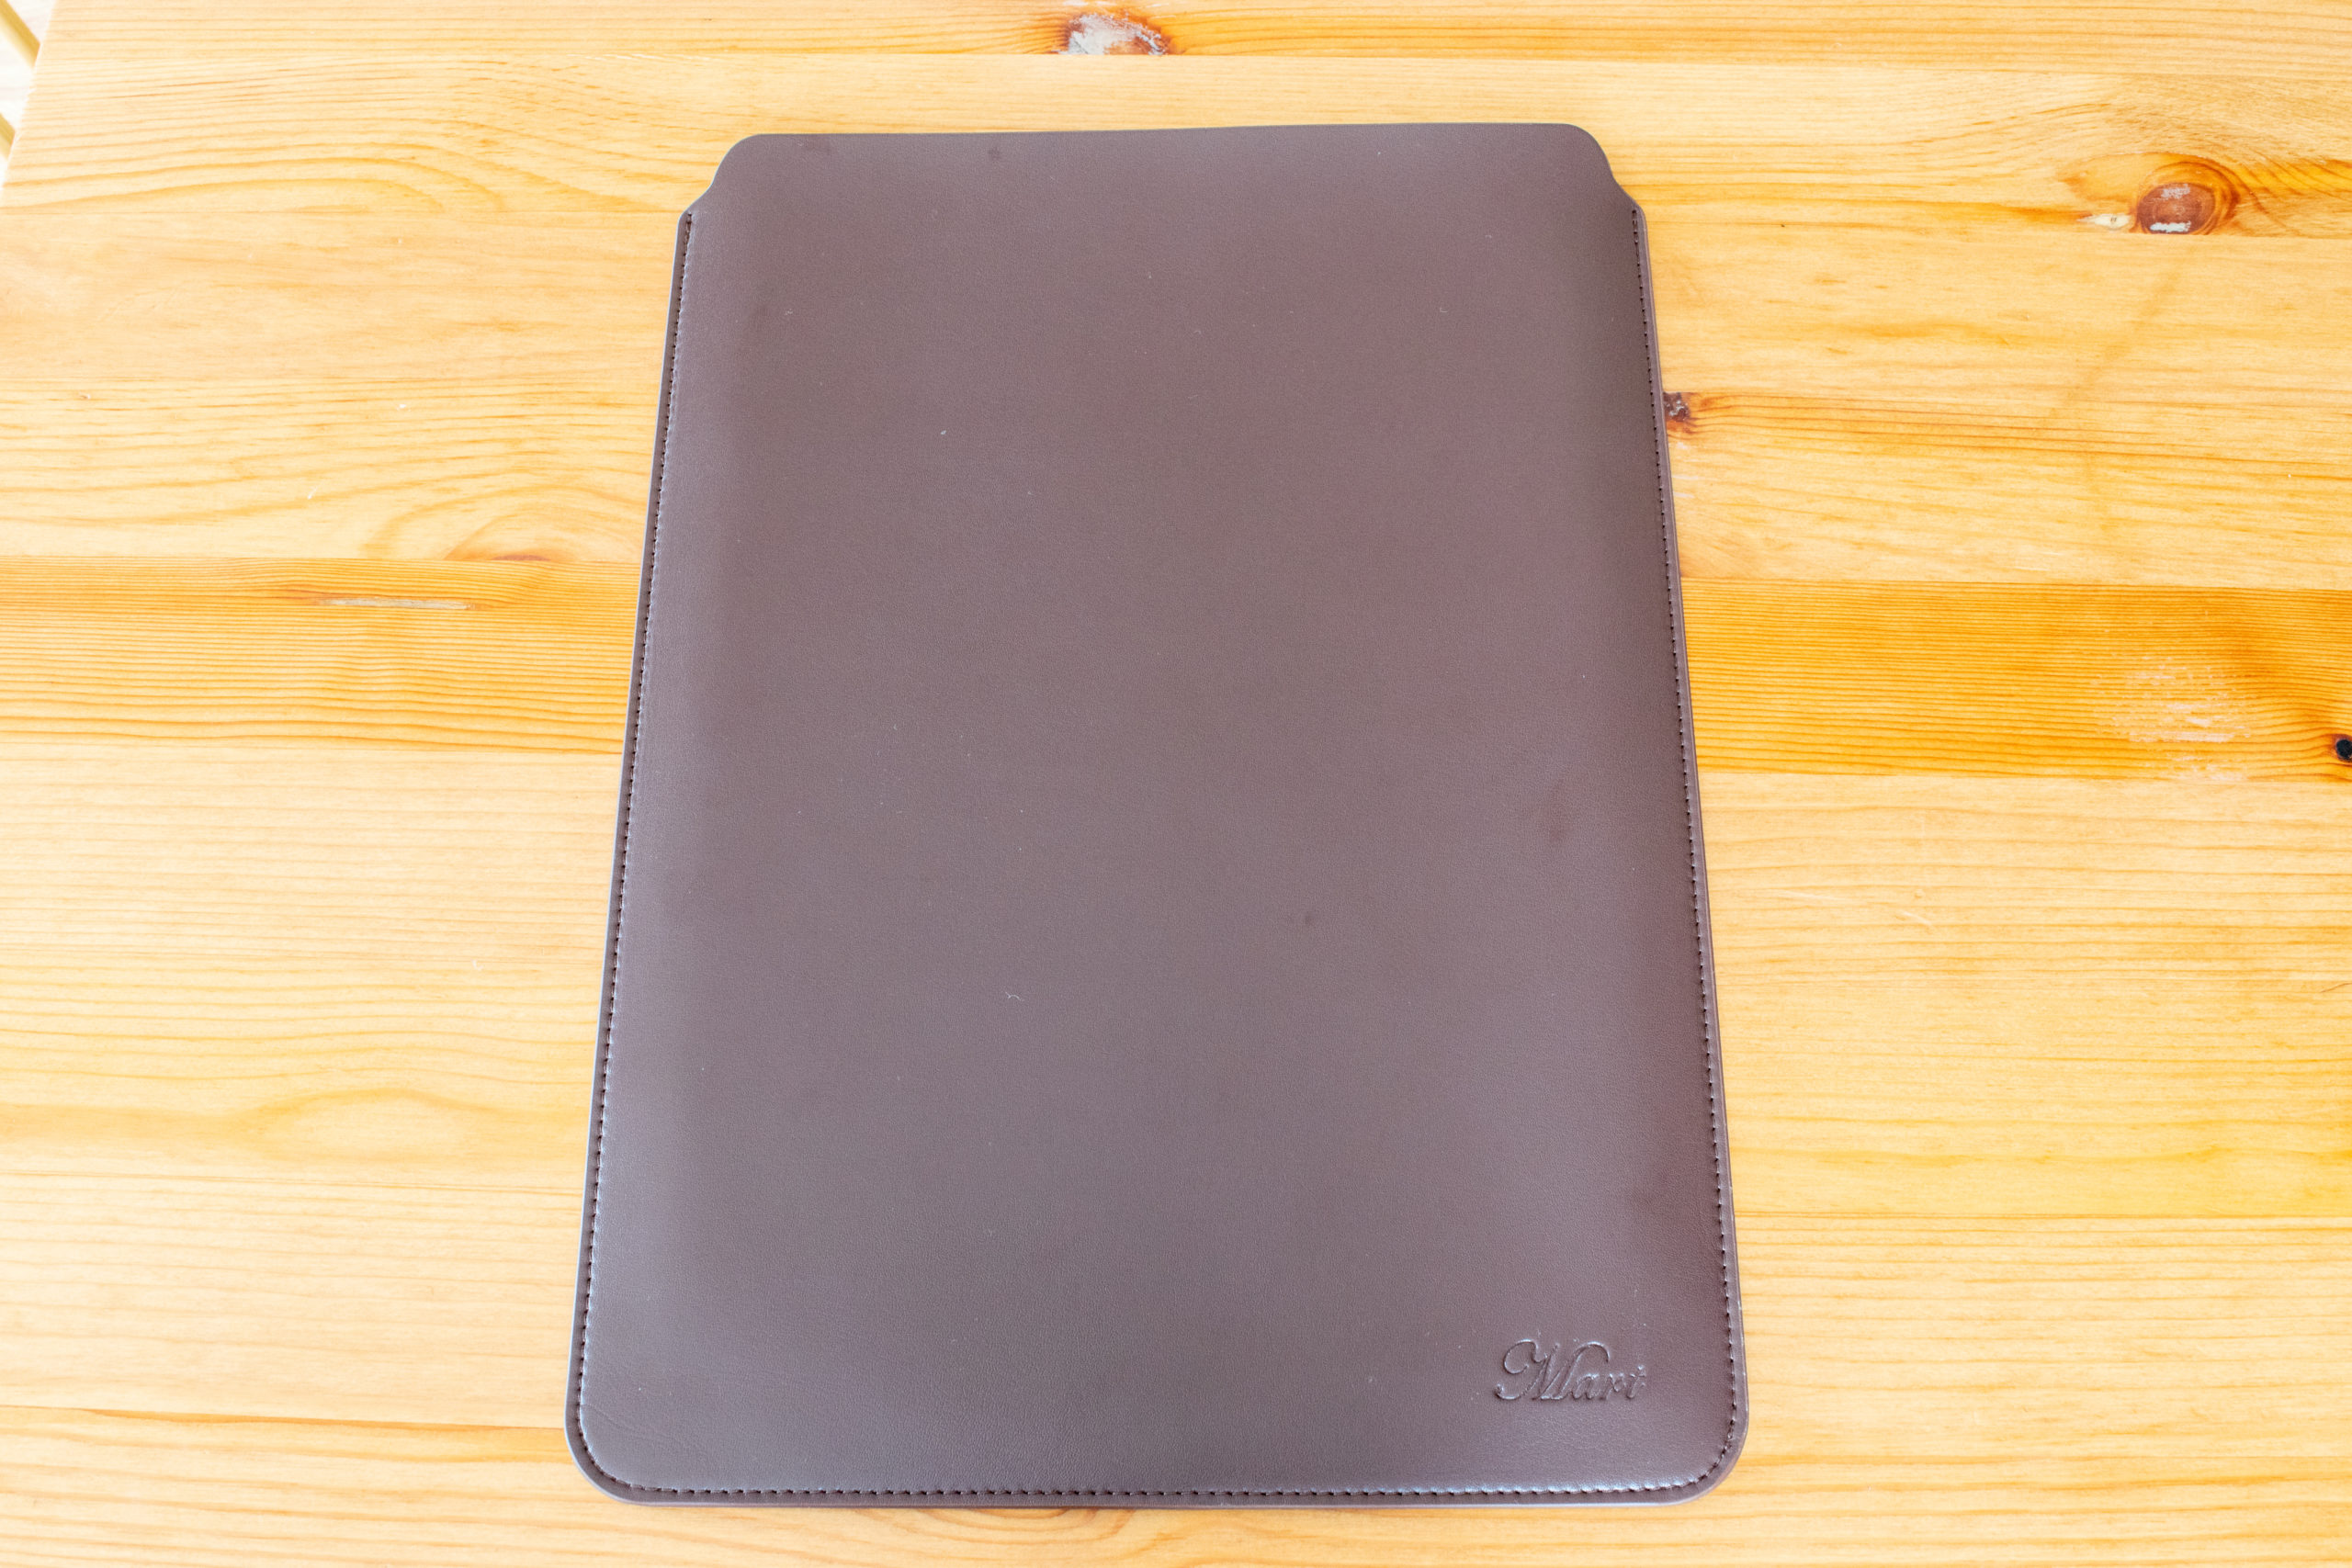 M.V (Valueble Mart)のスリーブケース(Surface Pro 7用)【レビュー】